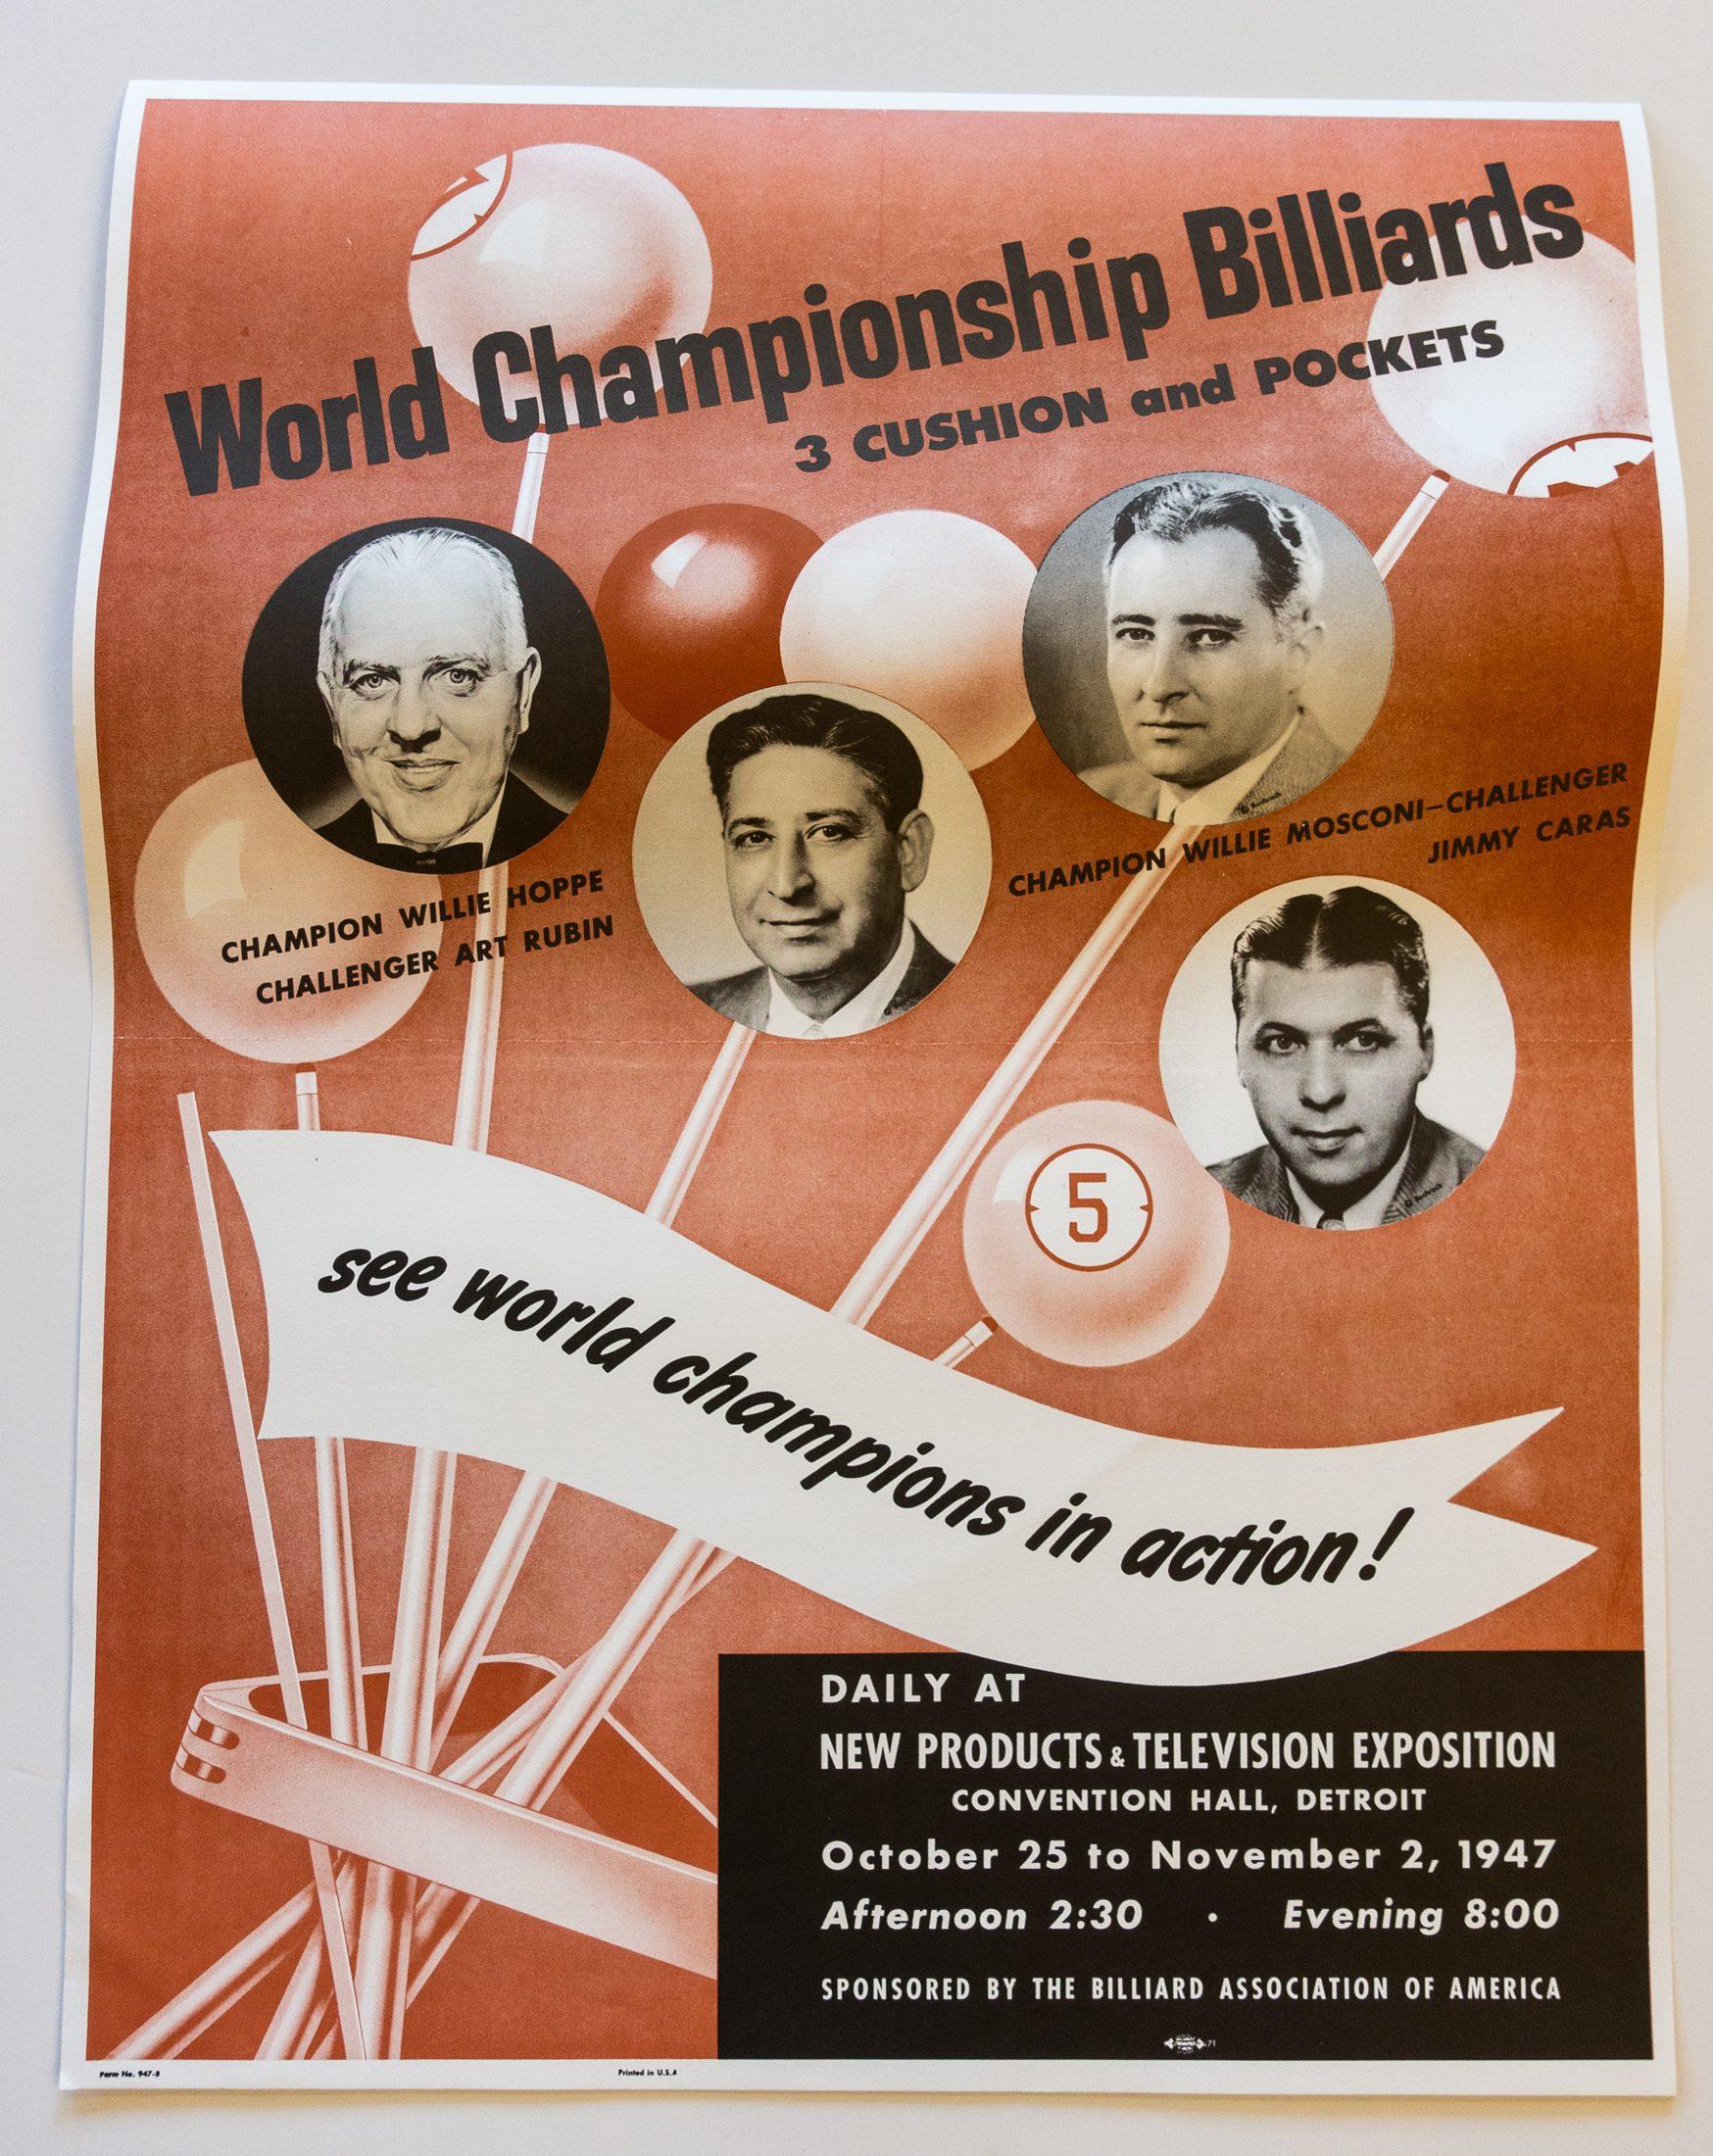 World Champions billiards poster